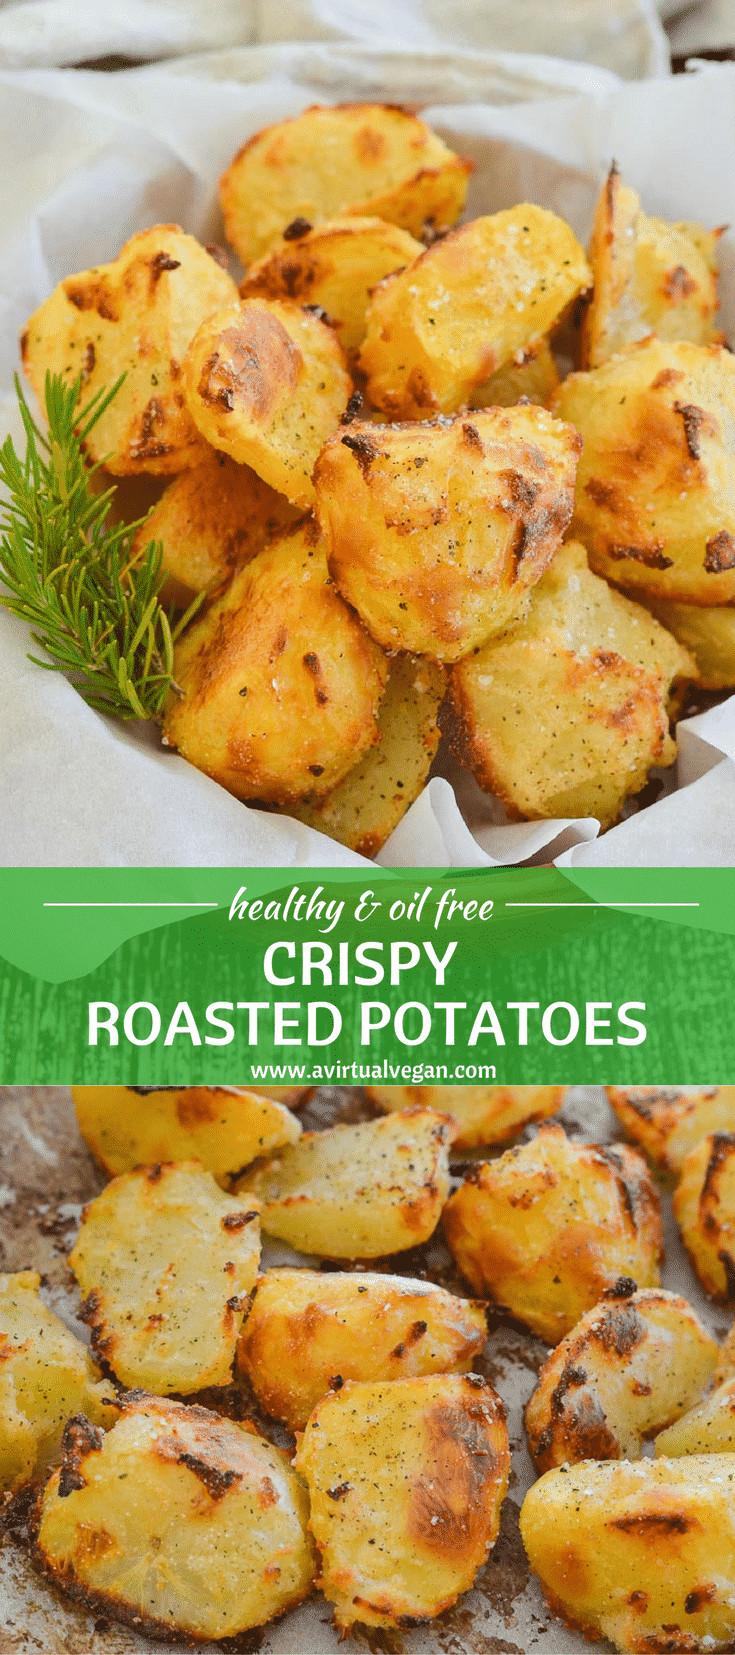 Calories In Roasted Potatoes  Healthy No Oil Crispy Roasted Potatoes A Virtual Vegan